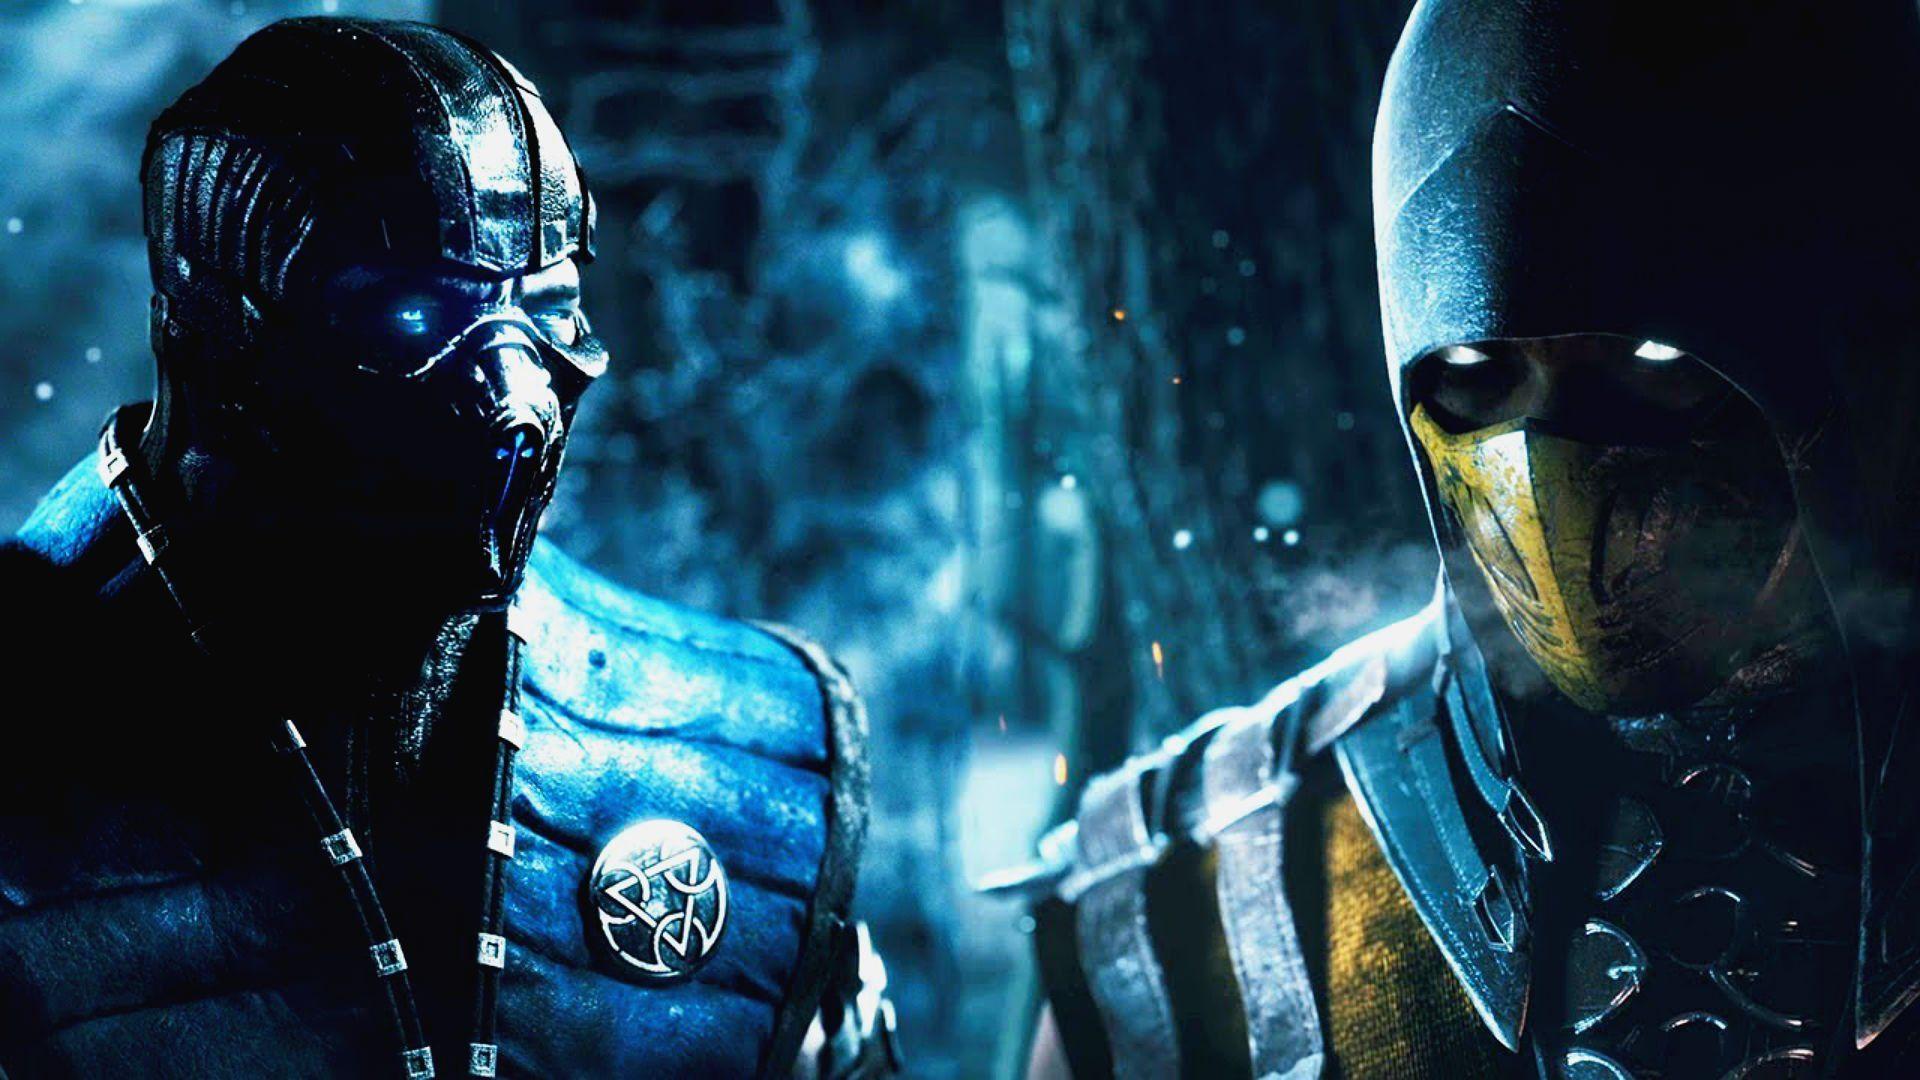 Mortal Kombat X Fight Con Imagenes Mortal Kombat Mortal